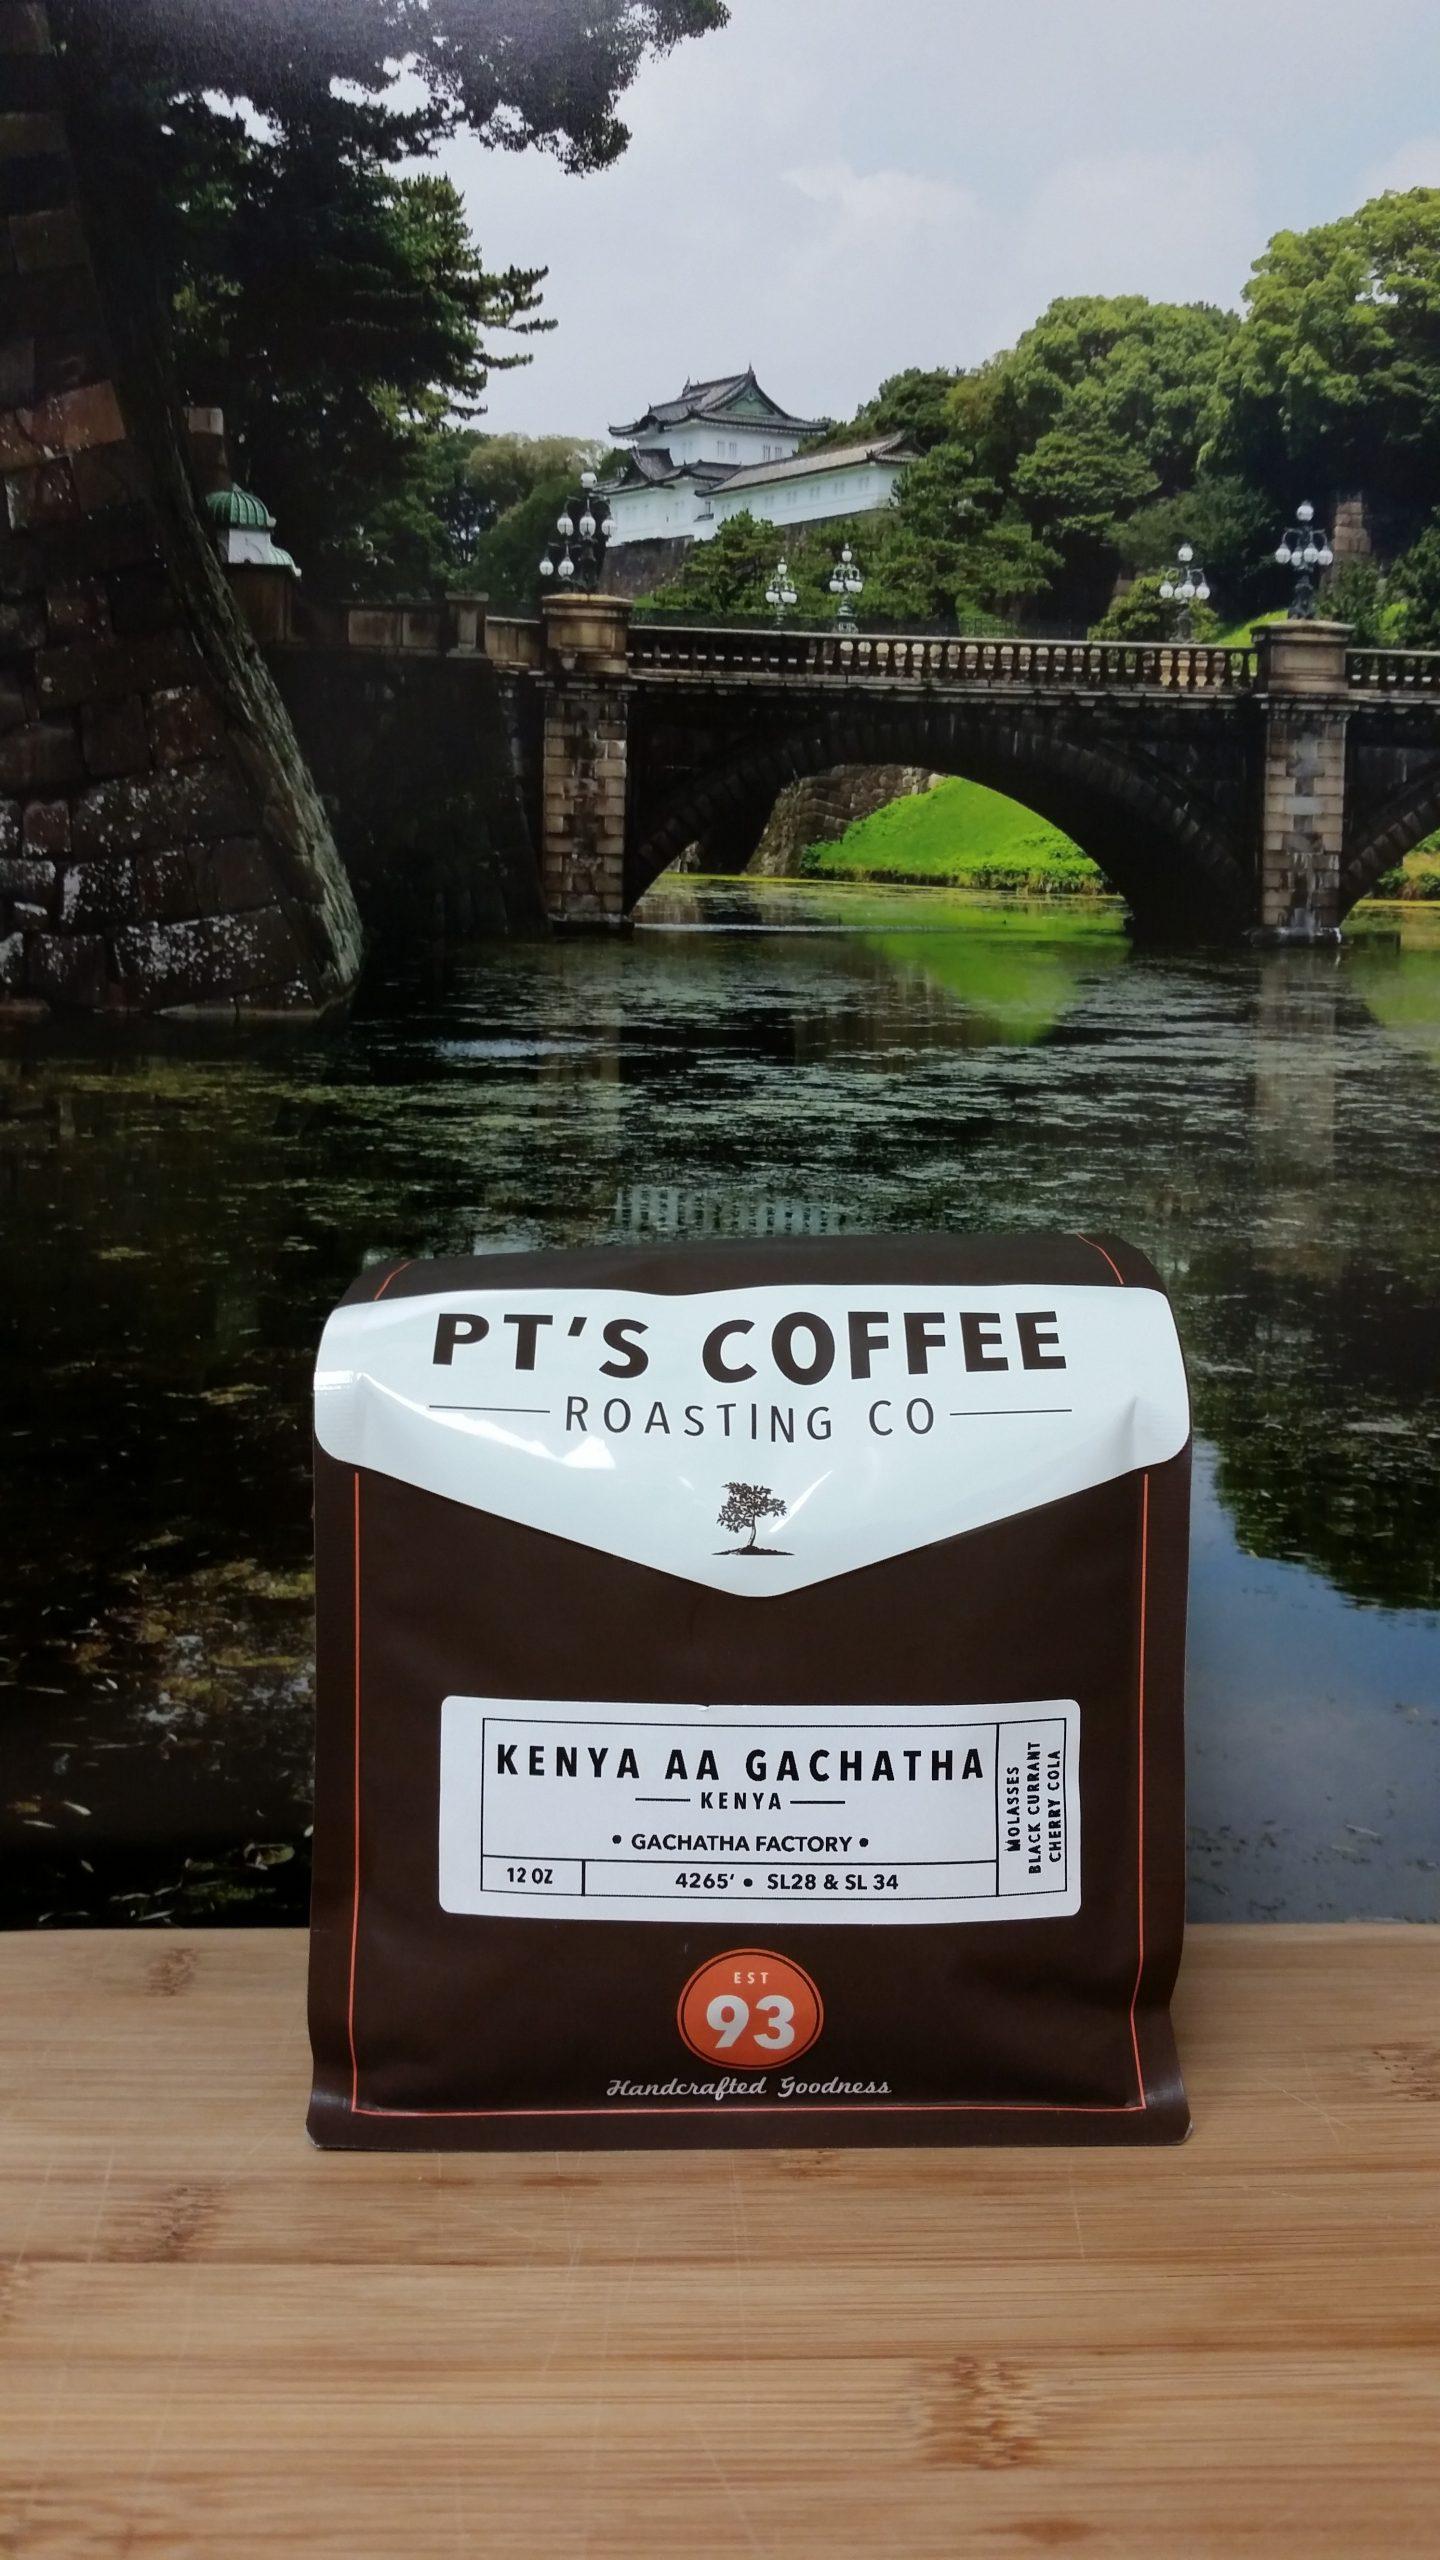 Kenya Gachatha AA from PT's Coffee Roasting Co.